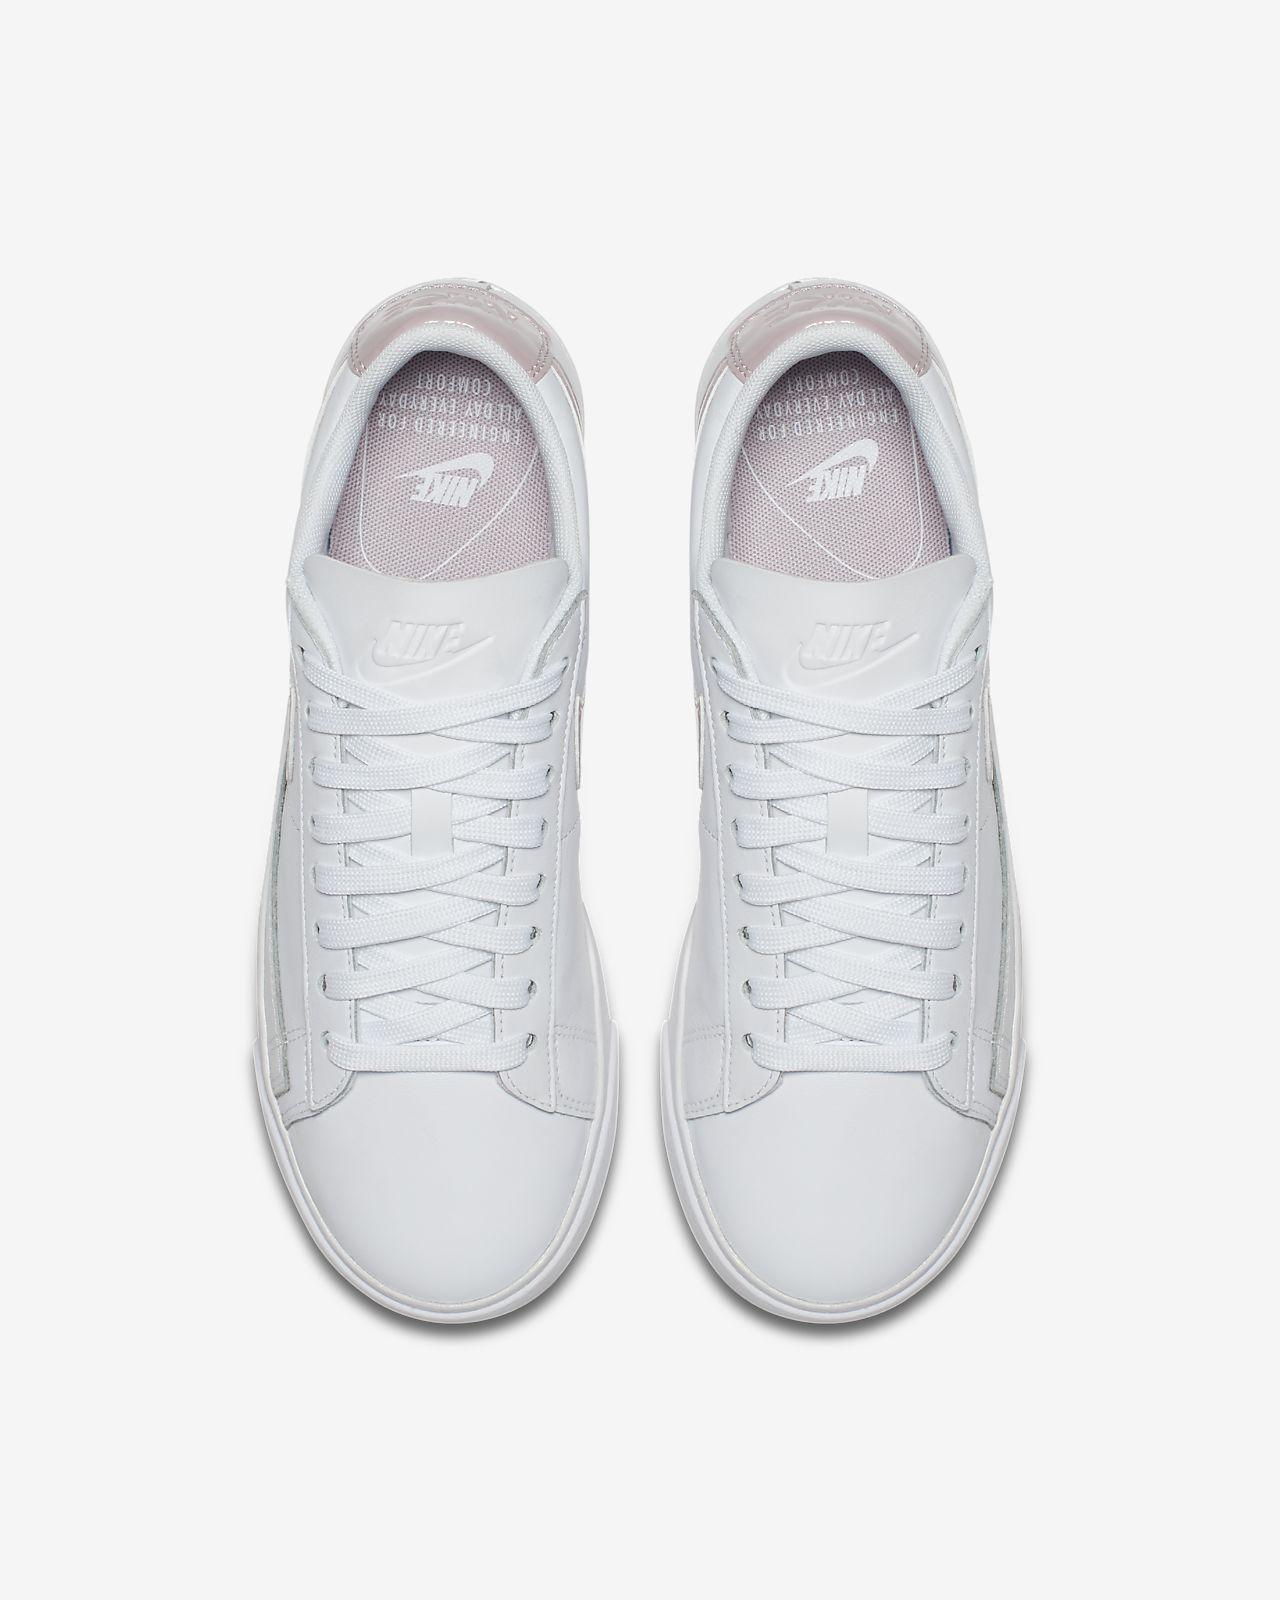 Nike Blazer Low Low Low LE Damenschuh Offiziell-AR3094DS   f67c31